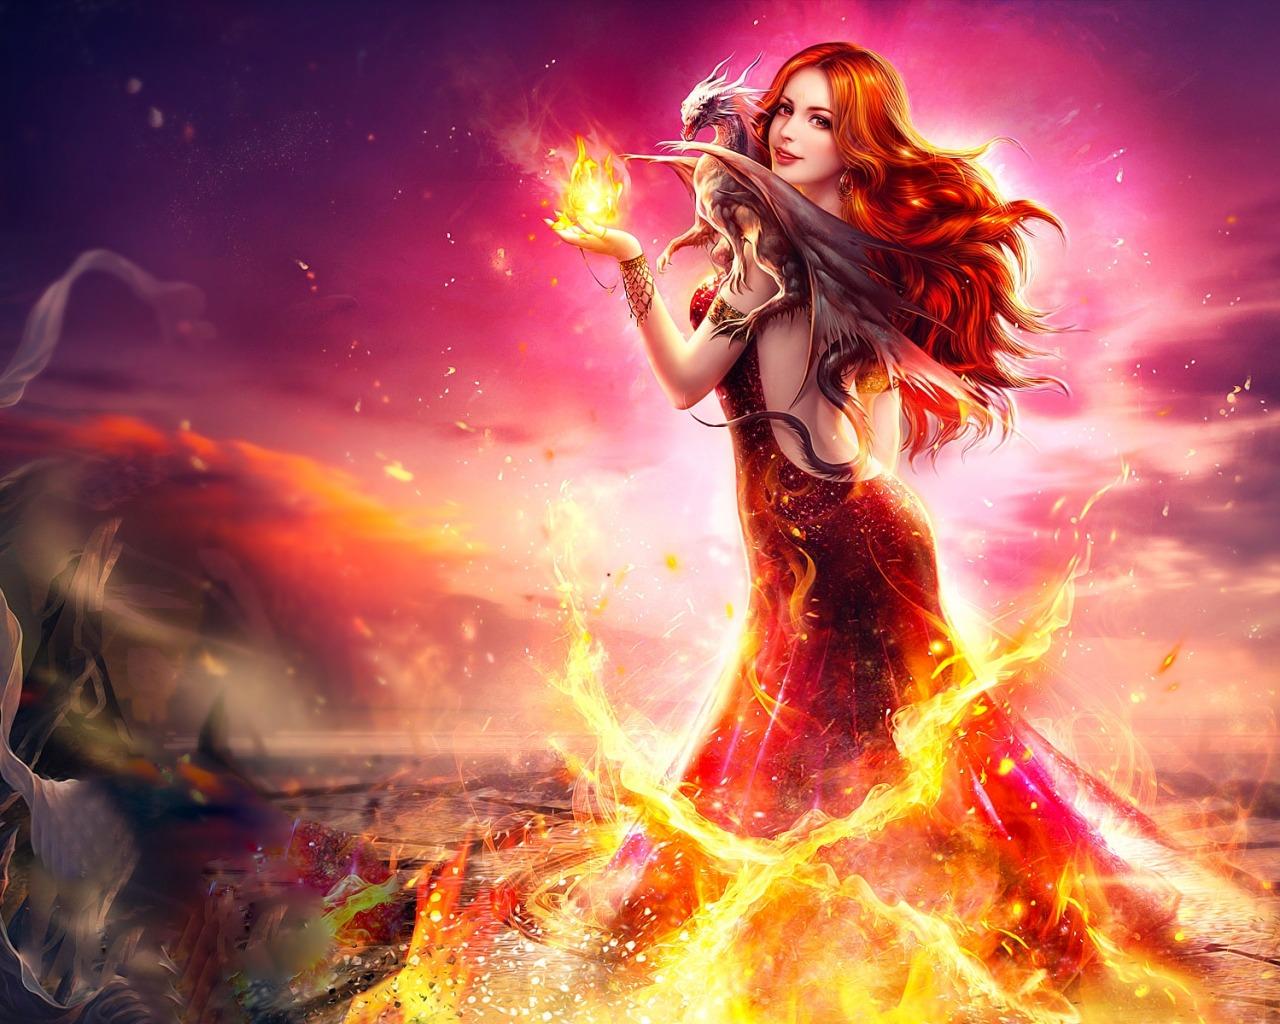 Картинки по запросу фото девушка в огне